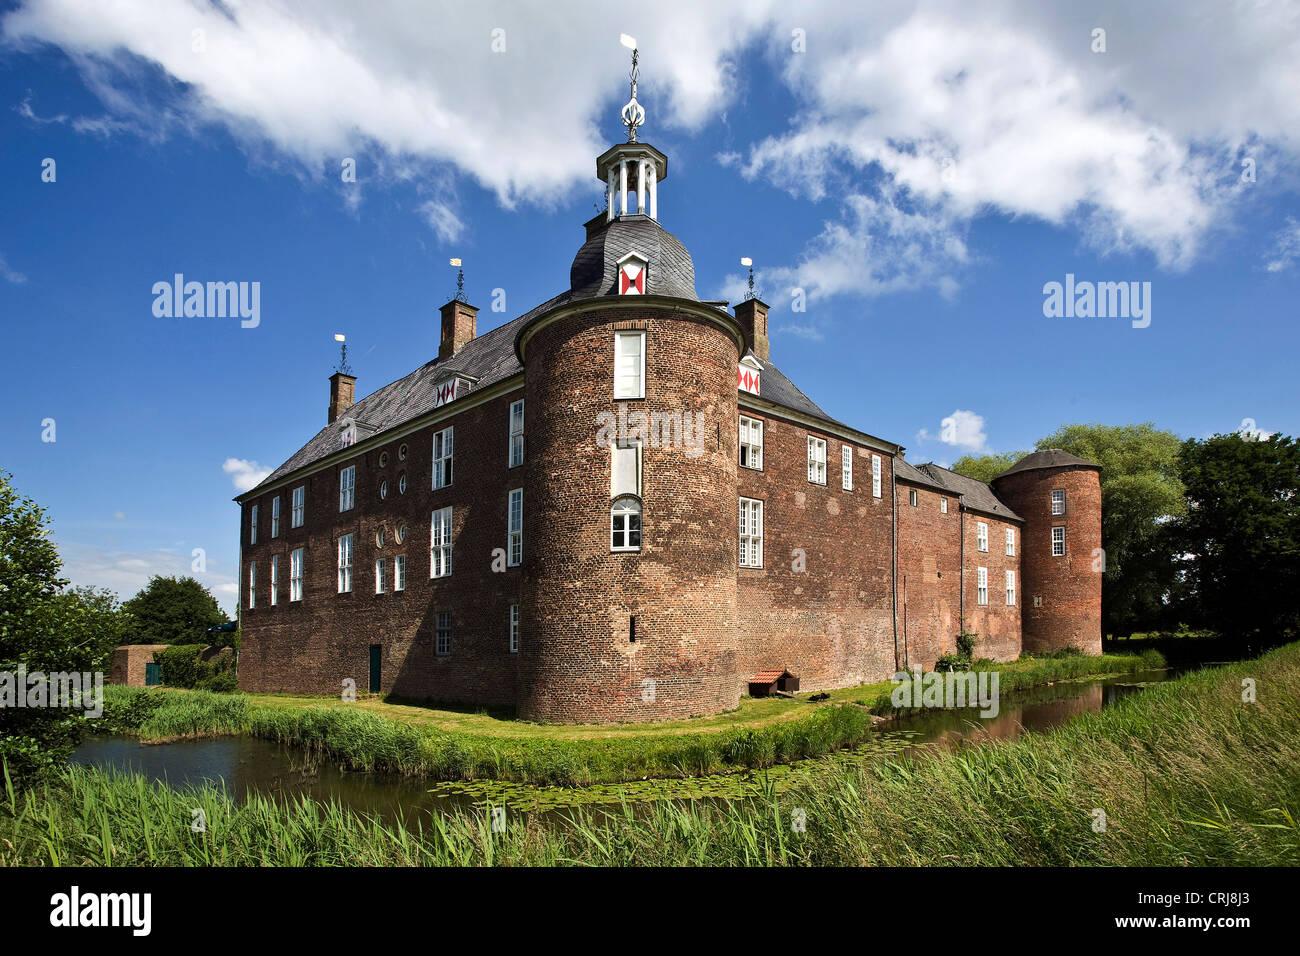 Ringenberg castle in Lower Rhine region, Niederrhein, Germany, North Rhine-Westphalia, Ruhr Area, Hamminkeln - Stock Image